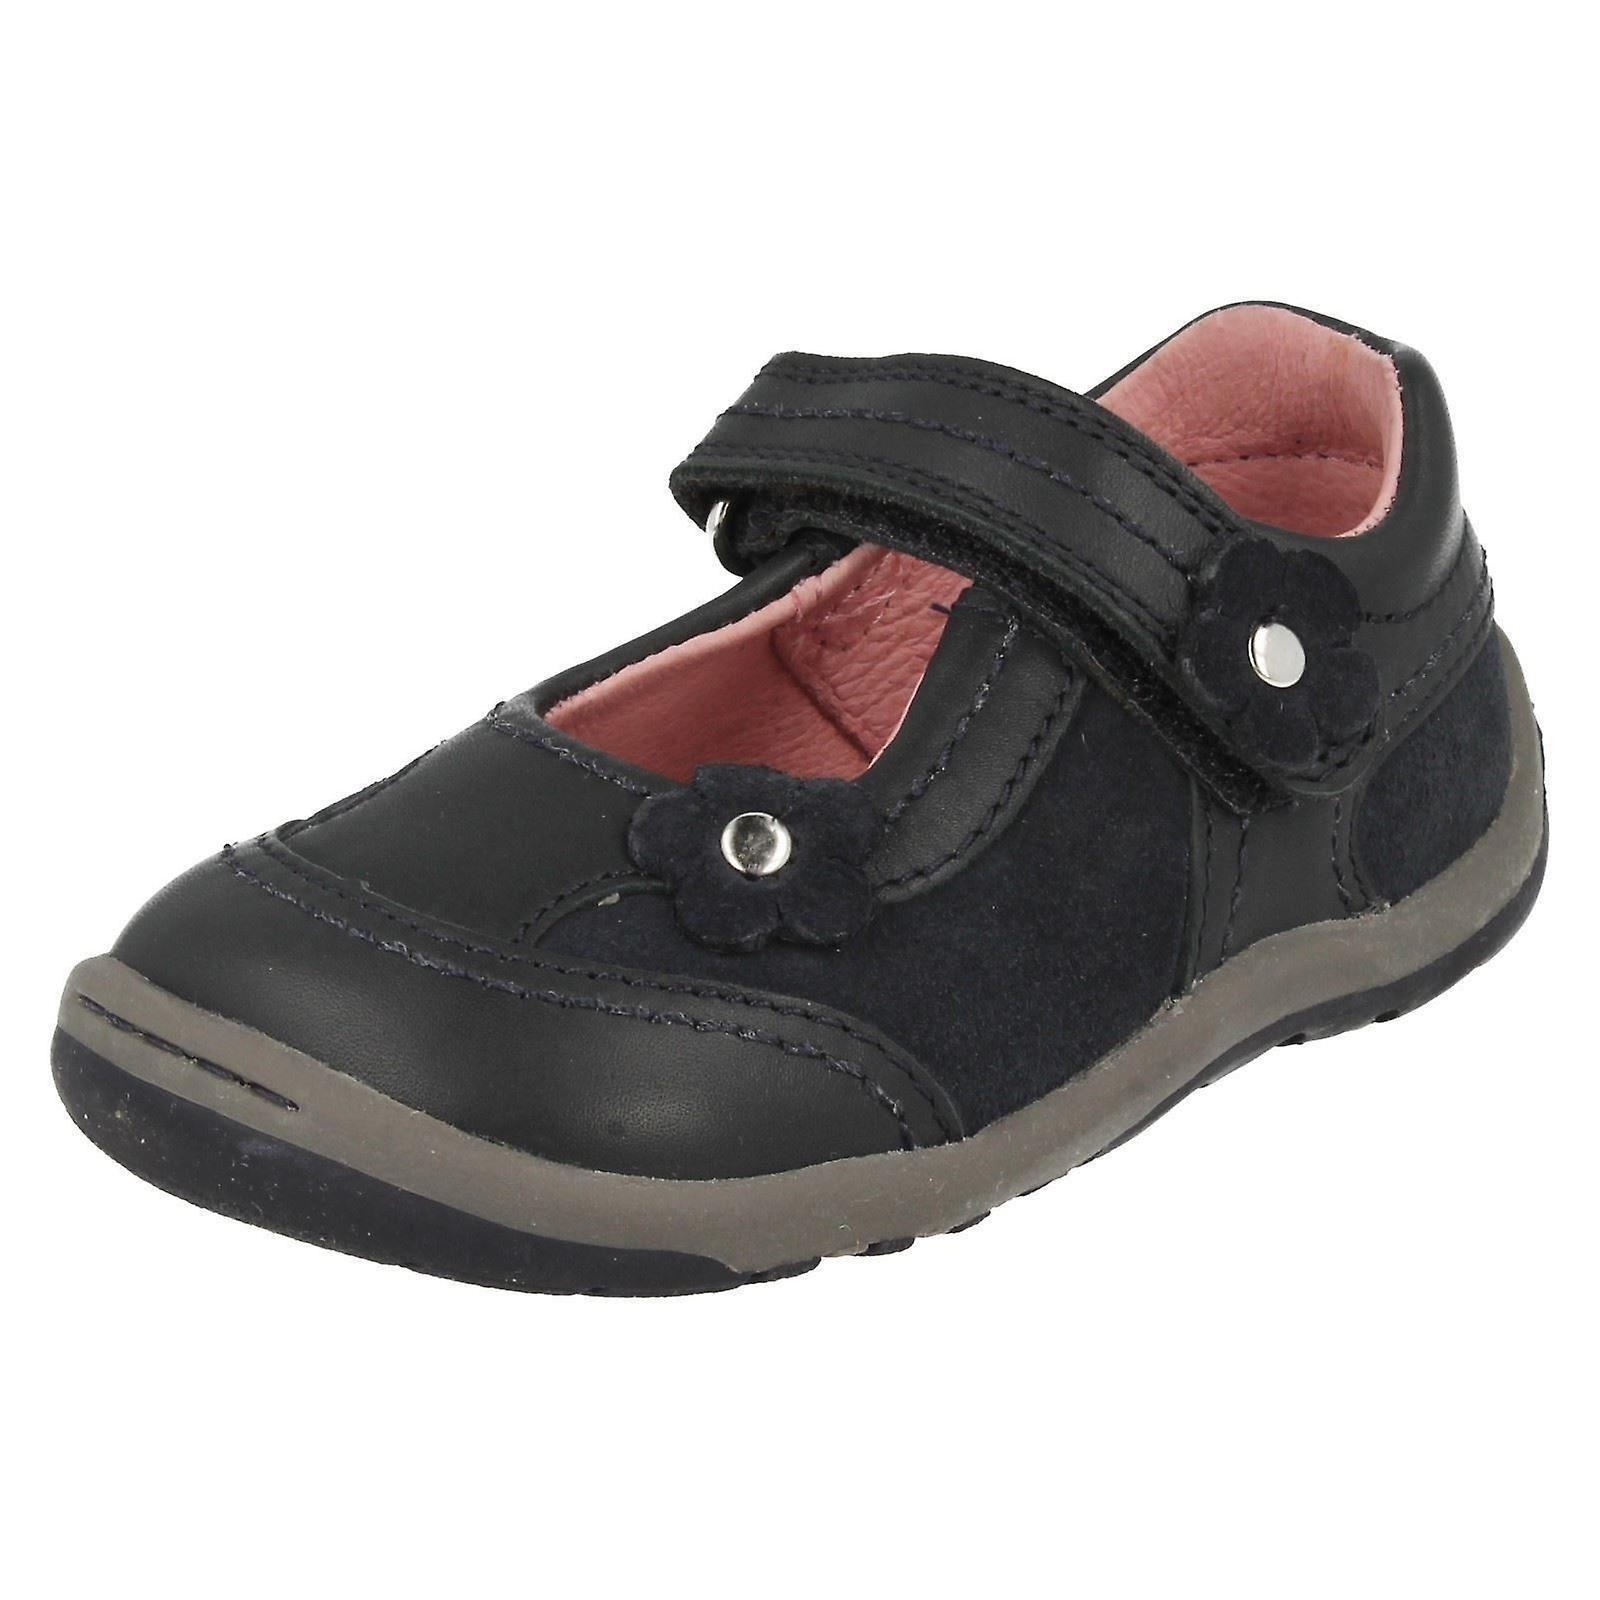 Girls Startrite Casual Shoes Petals- -Men's/Women's Excellent Value -Men's/Women's Petals- b0d4b1